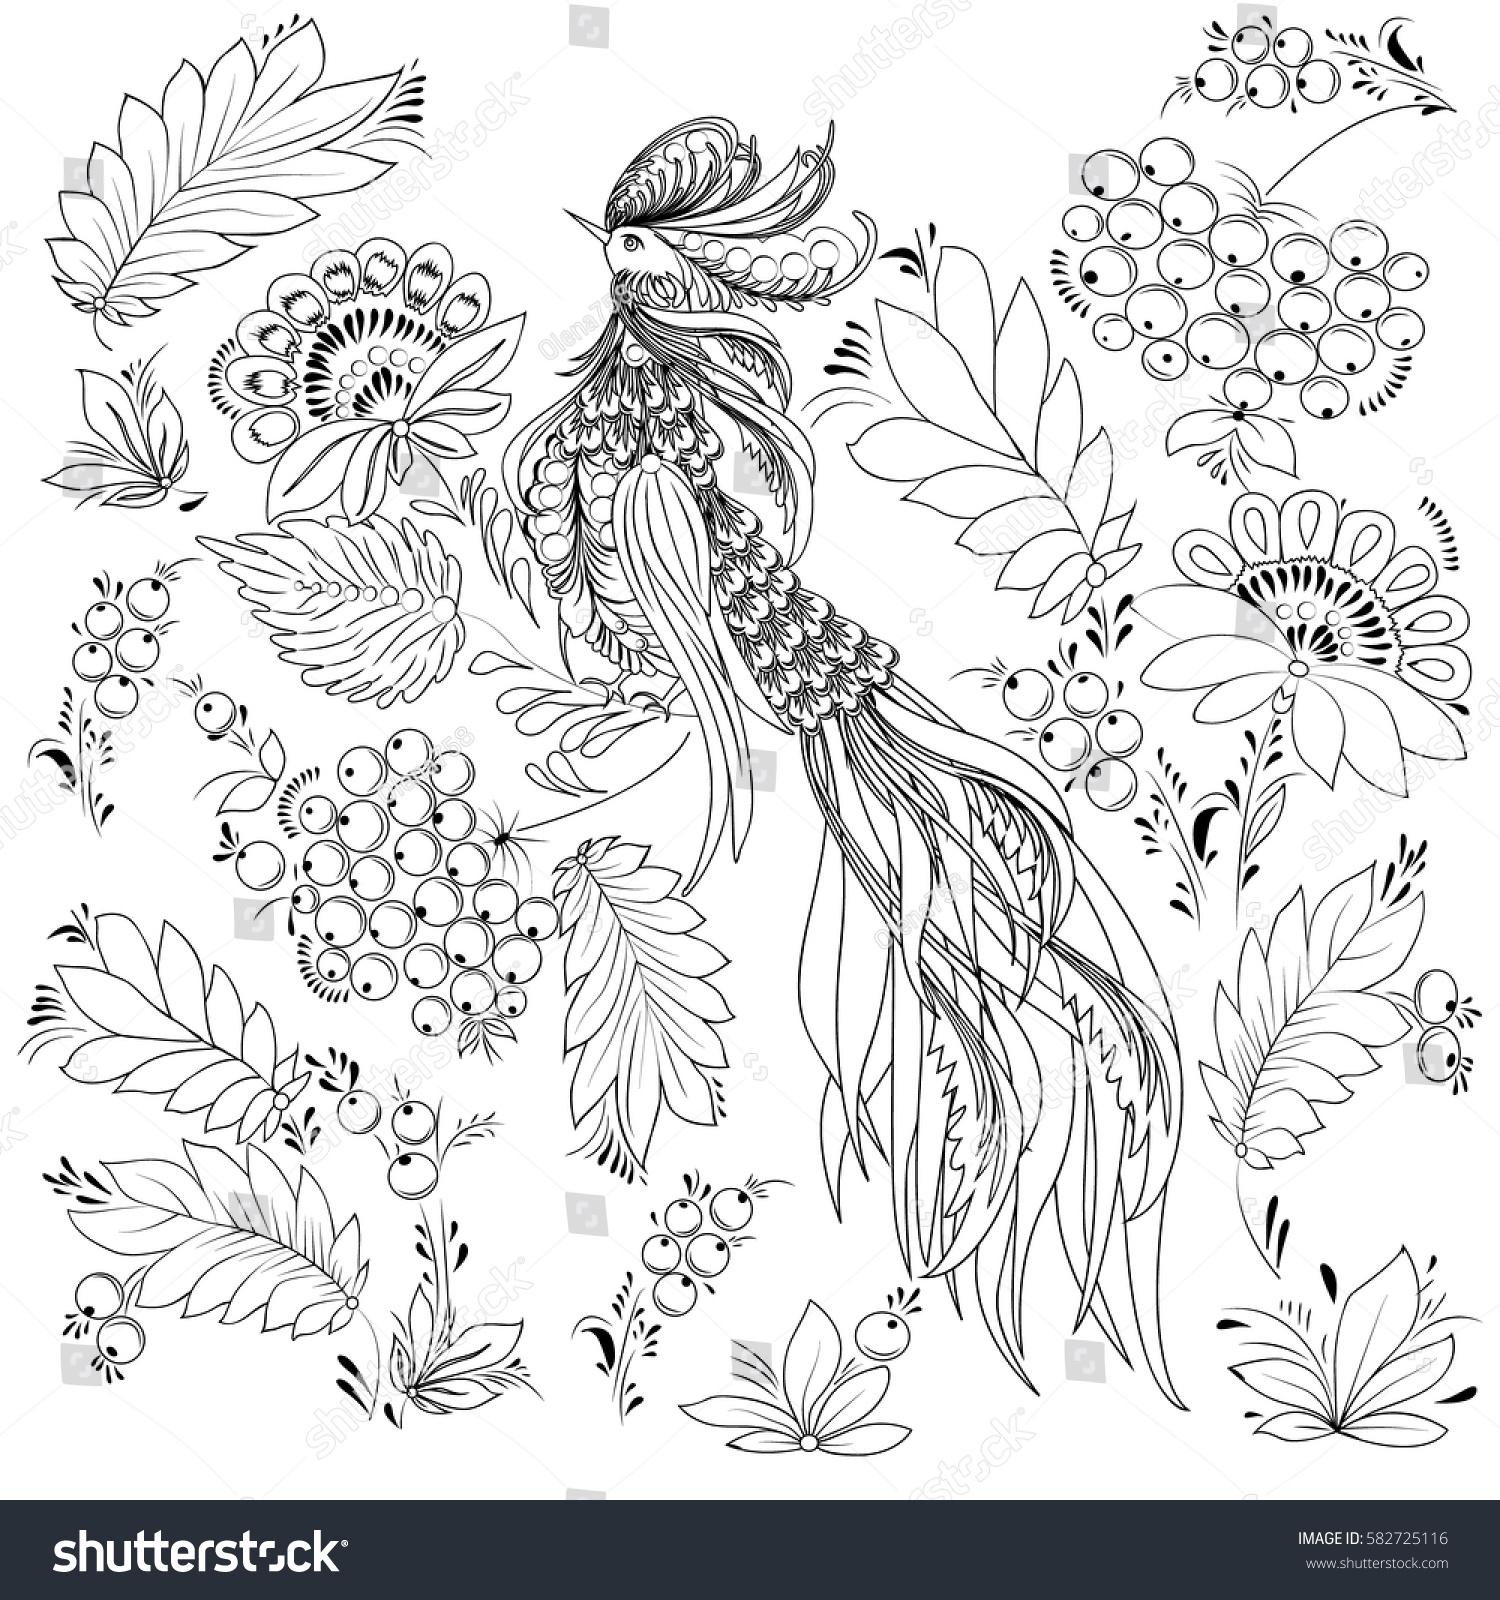 Cute Decorative Bird Vector Illustration Flowers Stock Vector